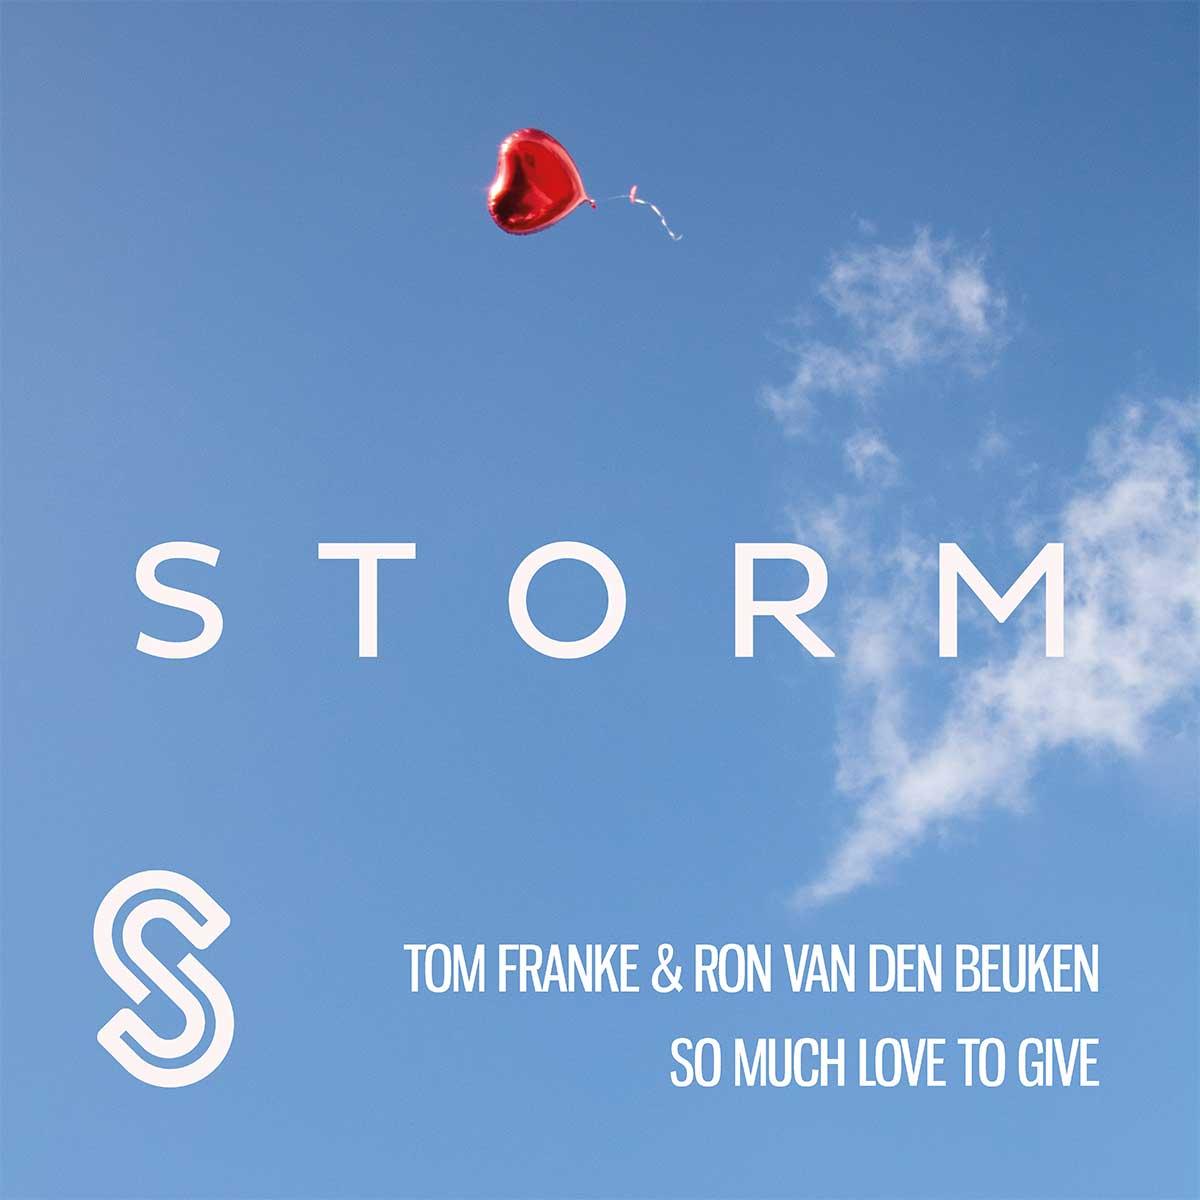 TOM FRANKE & RON VAN DEN BEUKEN-So Much Love To Give